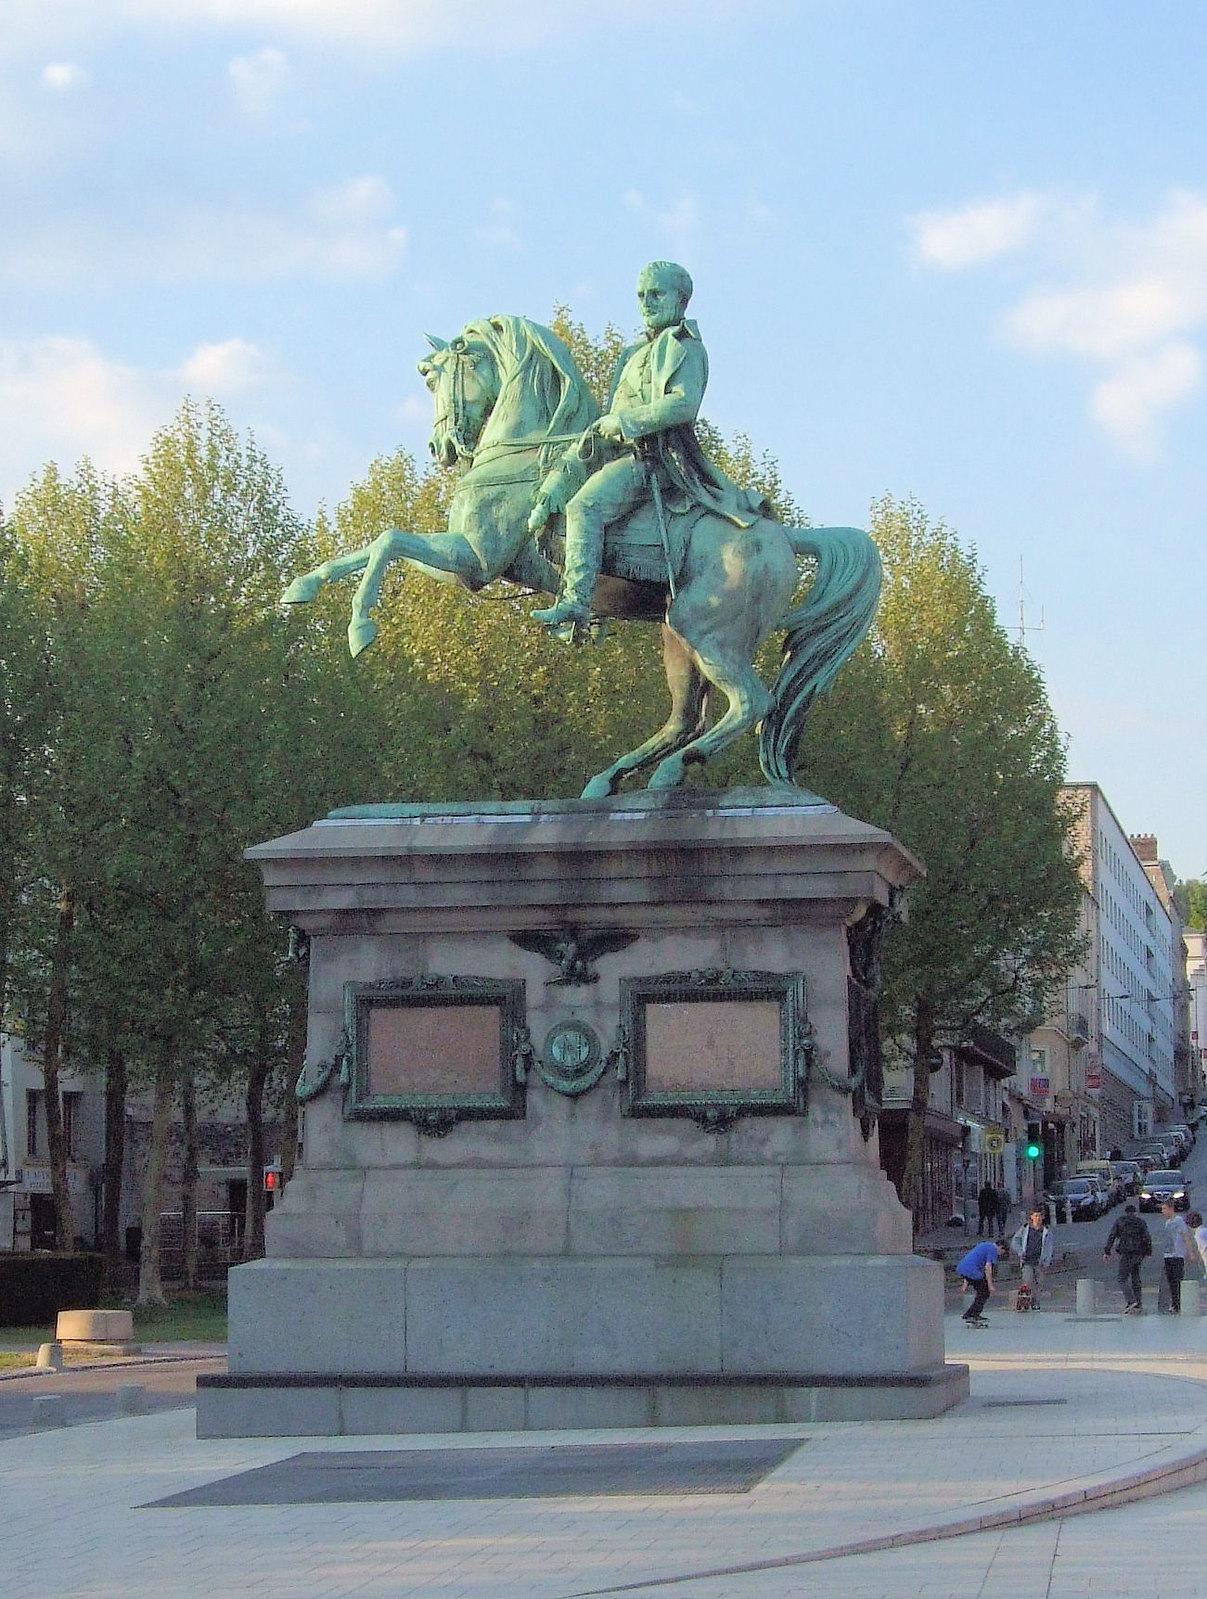 Statue of Napoléon I, 1865, Gabriel Vital Dubray, Rouen, France